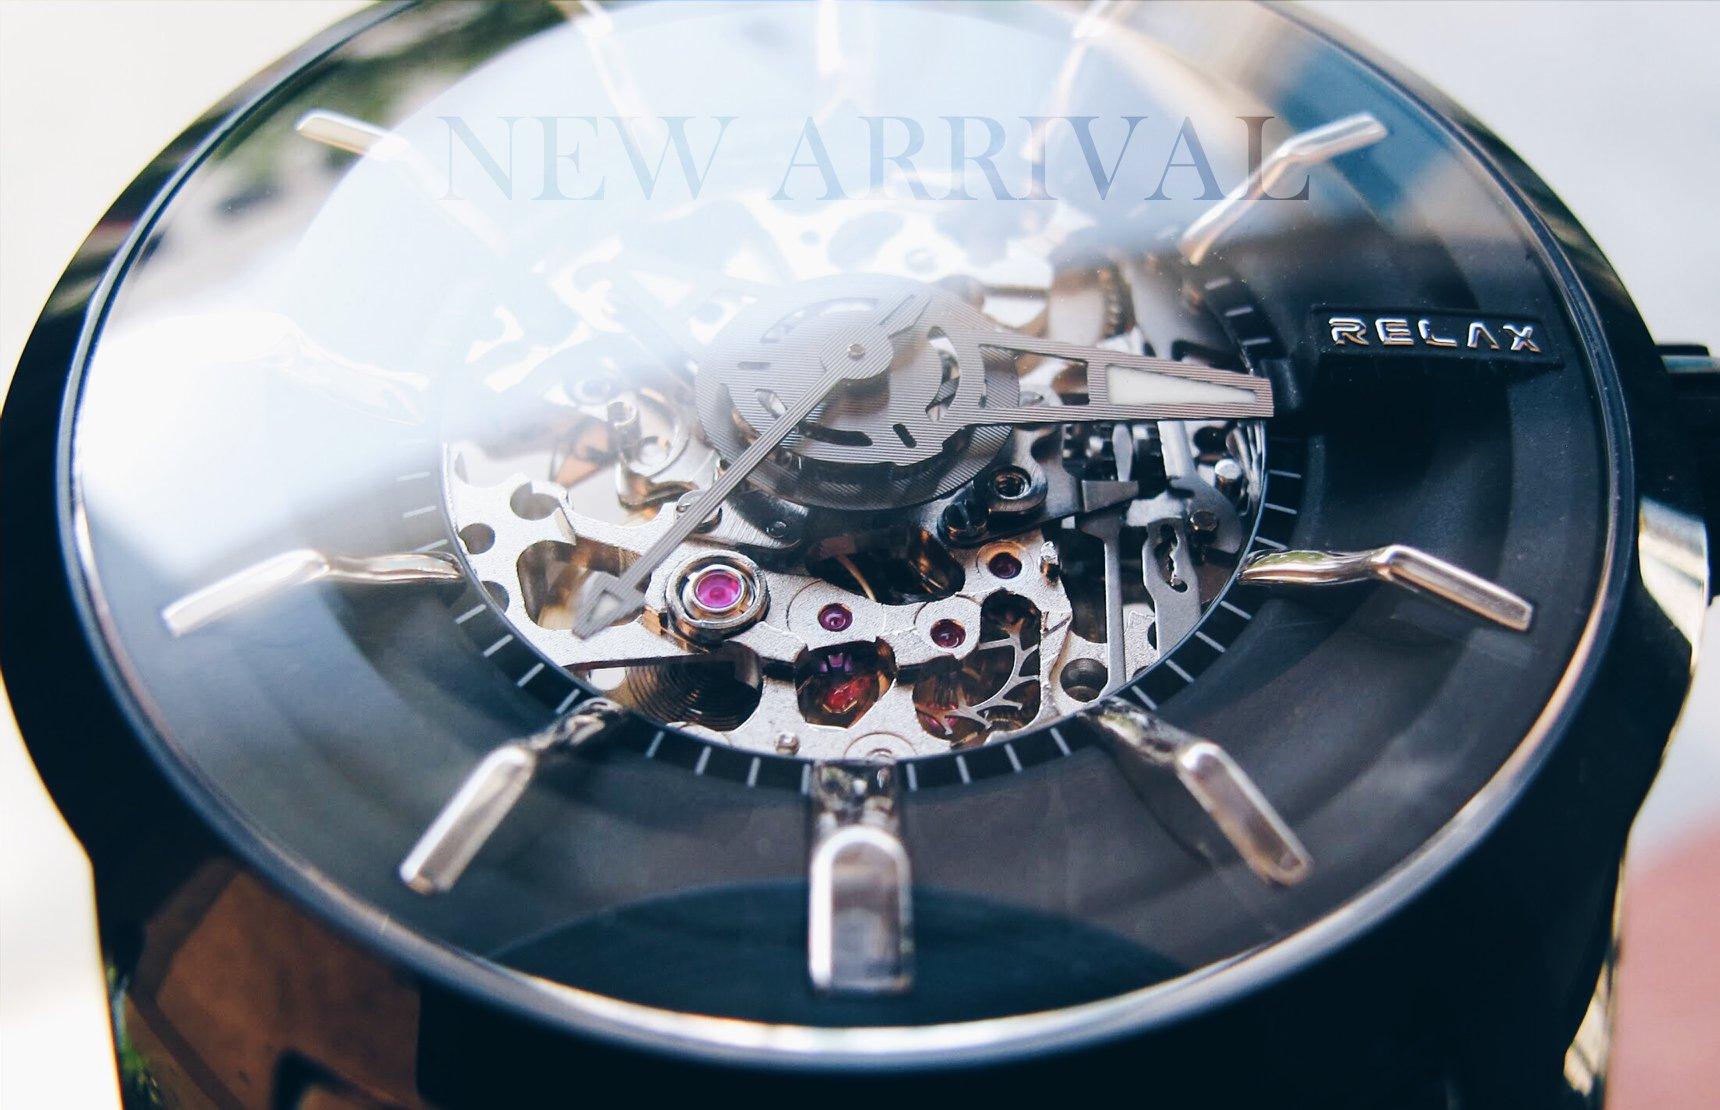 Relax Time【新品上市】日本機芯‧機械錶款RT-38J ∕  男錶 ∕ 8n24機芯 大錶徑設計搭配立體時標,藍寶石水晶鏡面